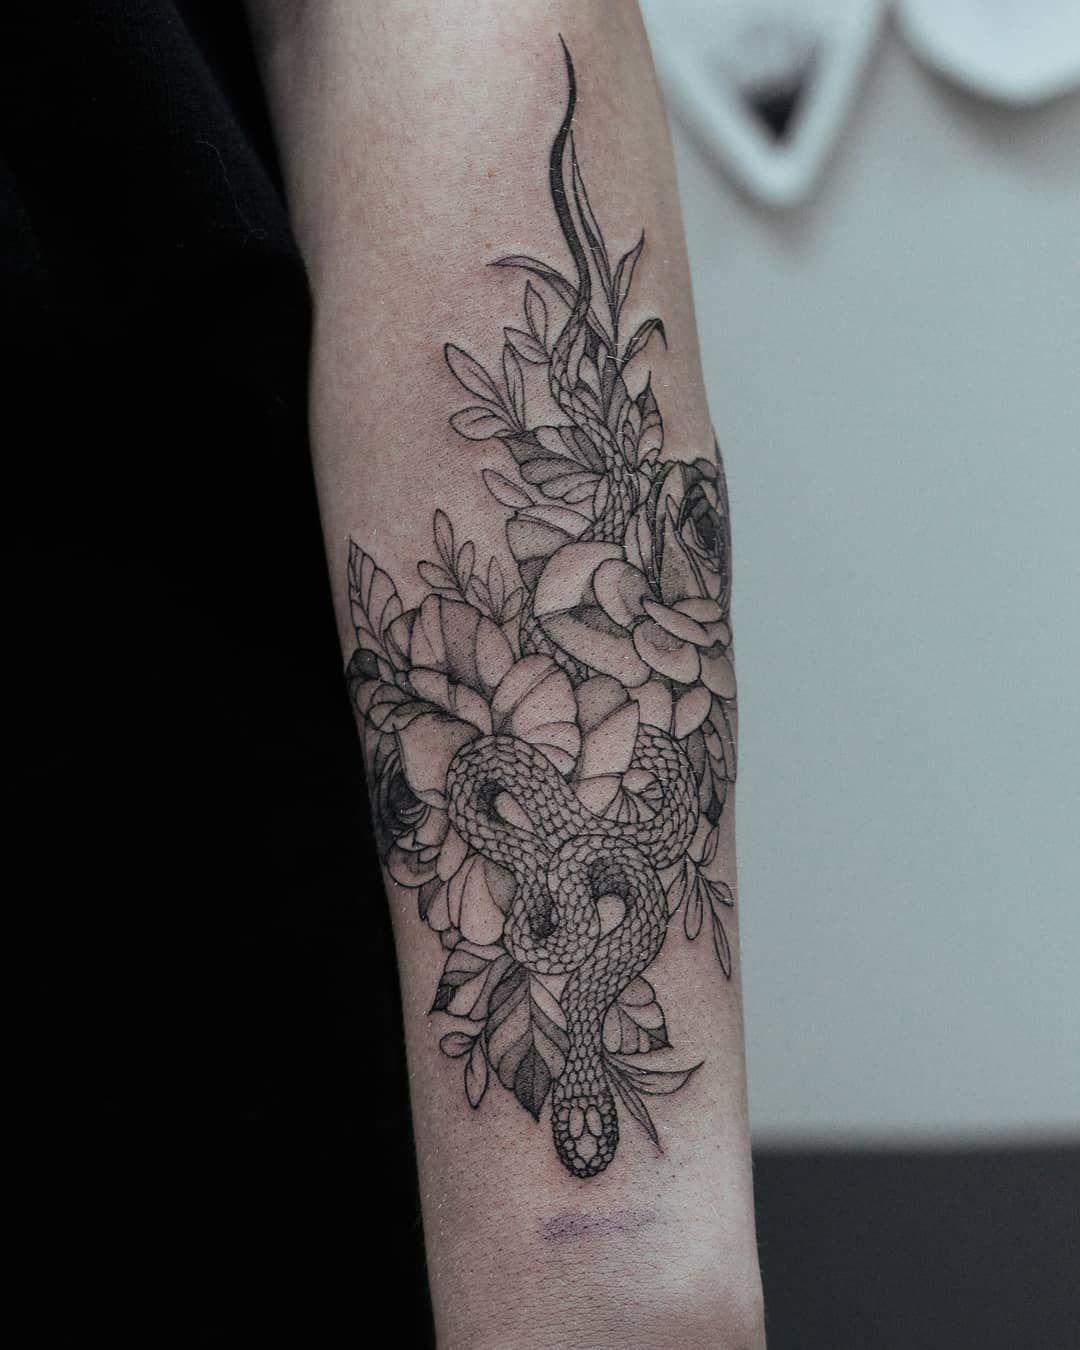 Snake for @__outlive_ 🌿  Для записи на сеанс/разработку эскиза пишите в директ 🖤✨ #owl_tattoo_mogilev #тату #татумогилев #могилев#tattoosketch #tattoostyle #tattooideas #tattoo_artwork #sketch #sketching #artist #art #artoftheday #flowers #tattooing #tattooartist #эскизытатуировок #эскиз  #overwatch #photographer #vsco #vscoapp #ink #photo #tattoo #tattomogilev #tattooed #graphic #blacktattoos